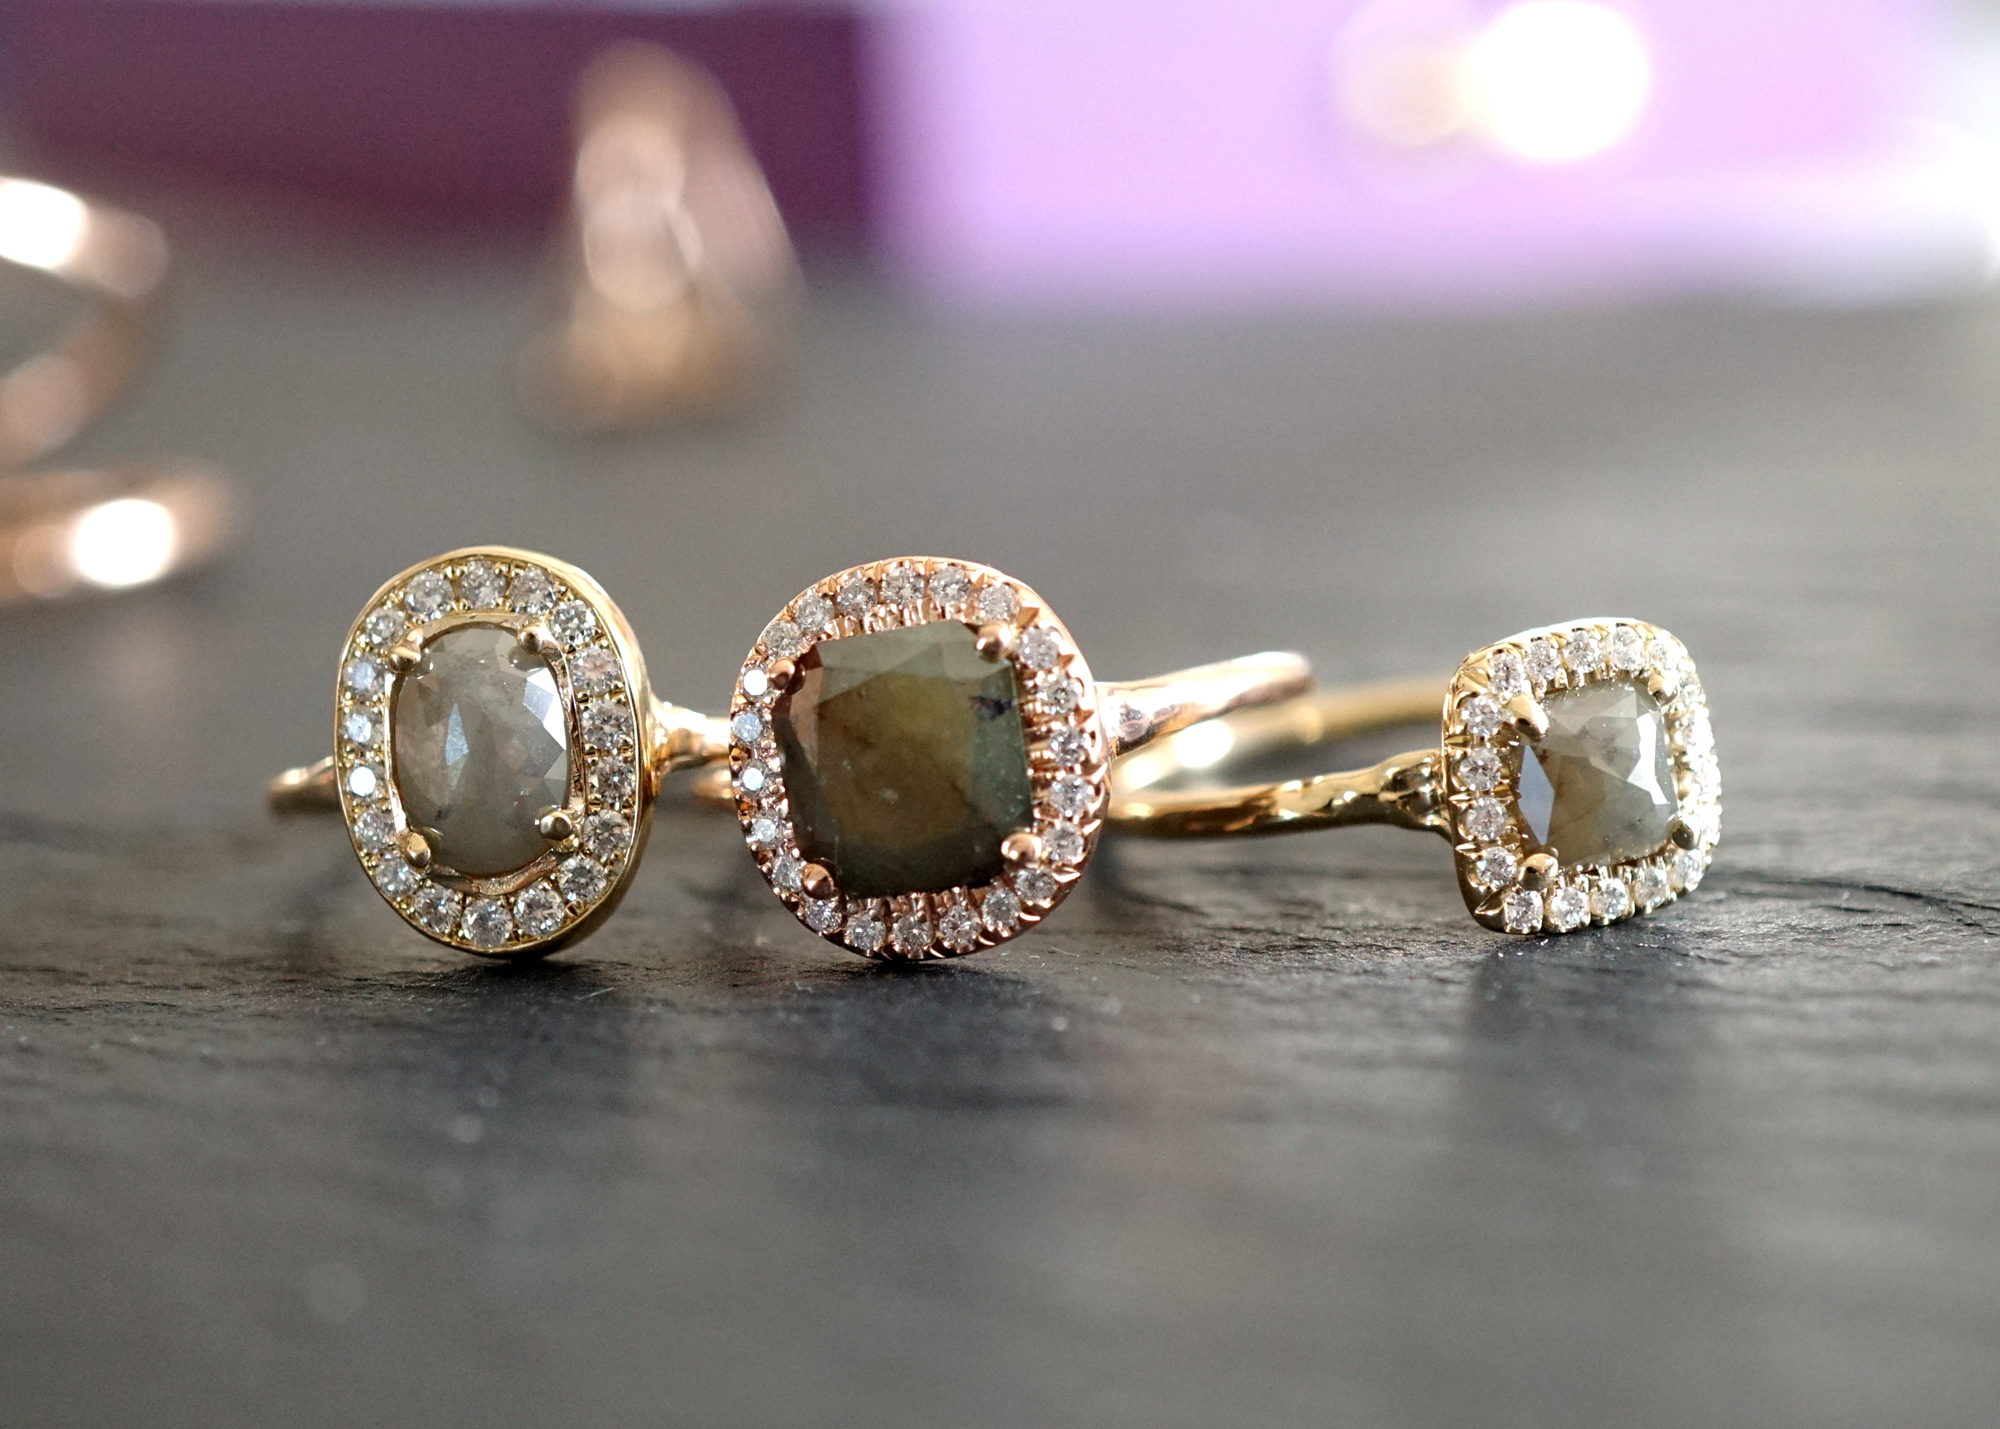 corinne simon jewelry 19